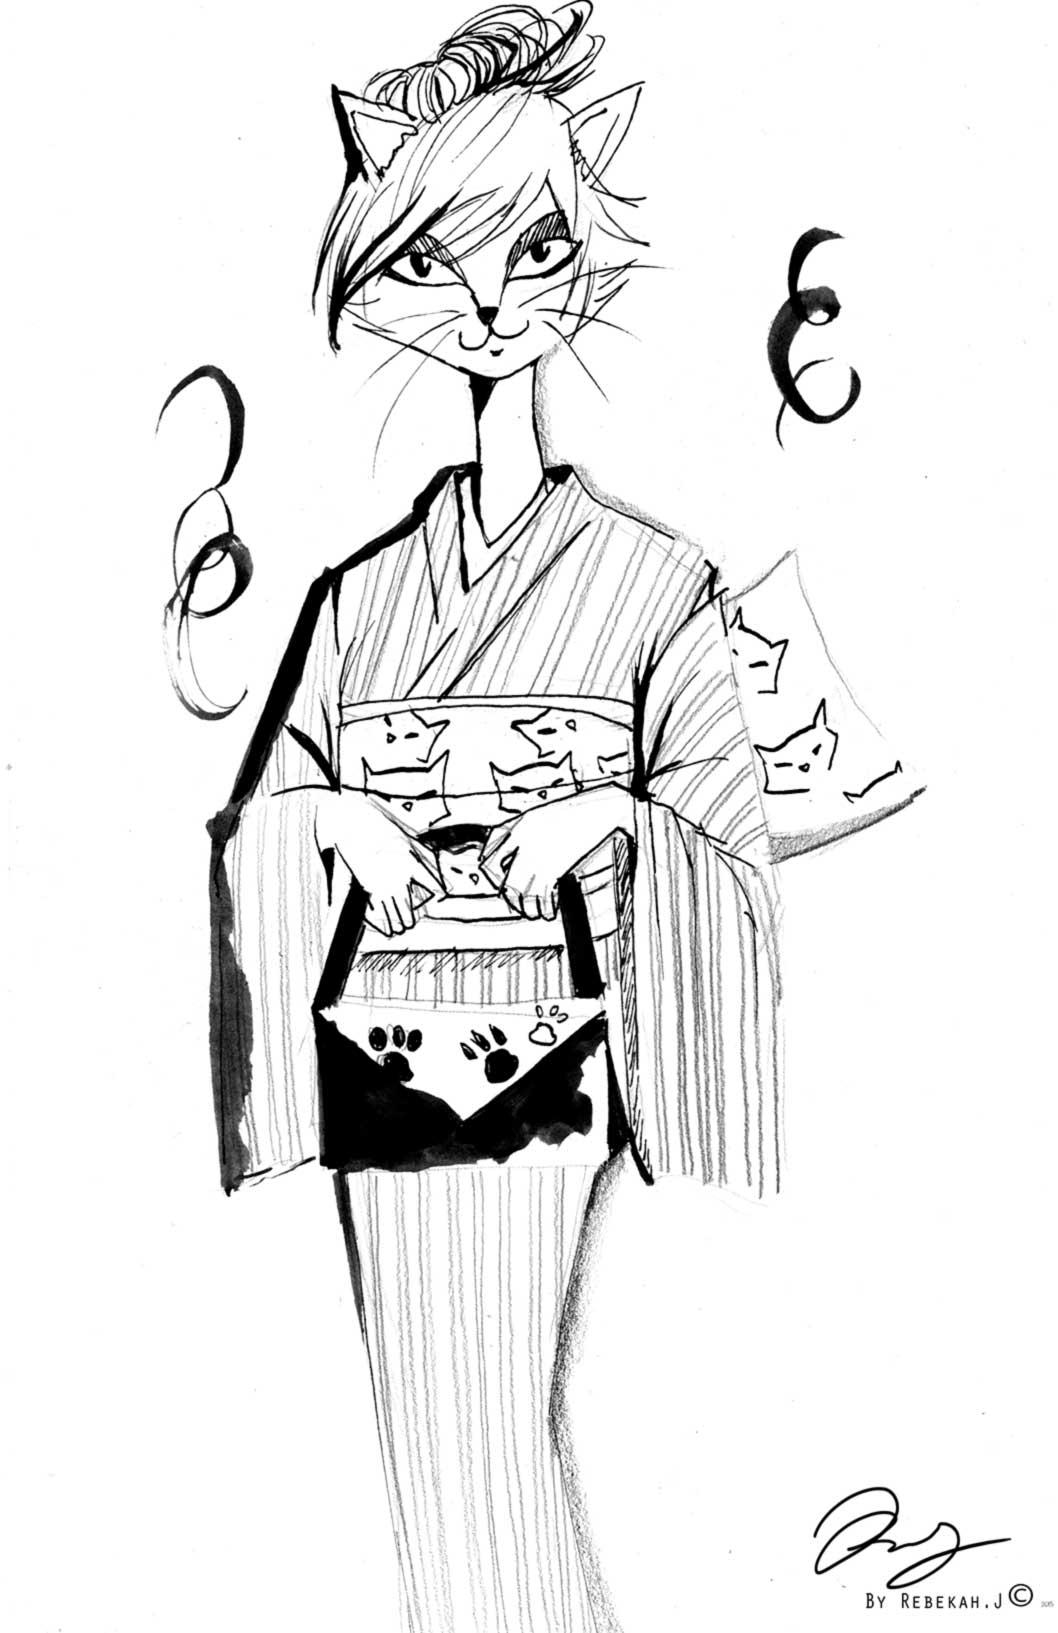 Cat Kimono Drawing by Rebekah Joseph, 2016 ink and pencil